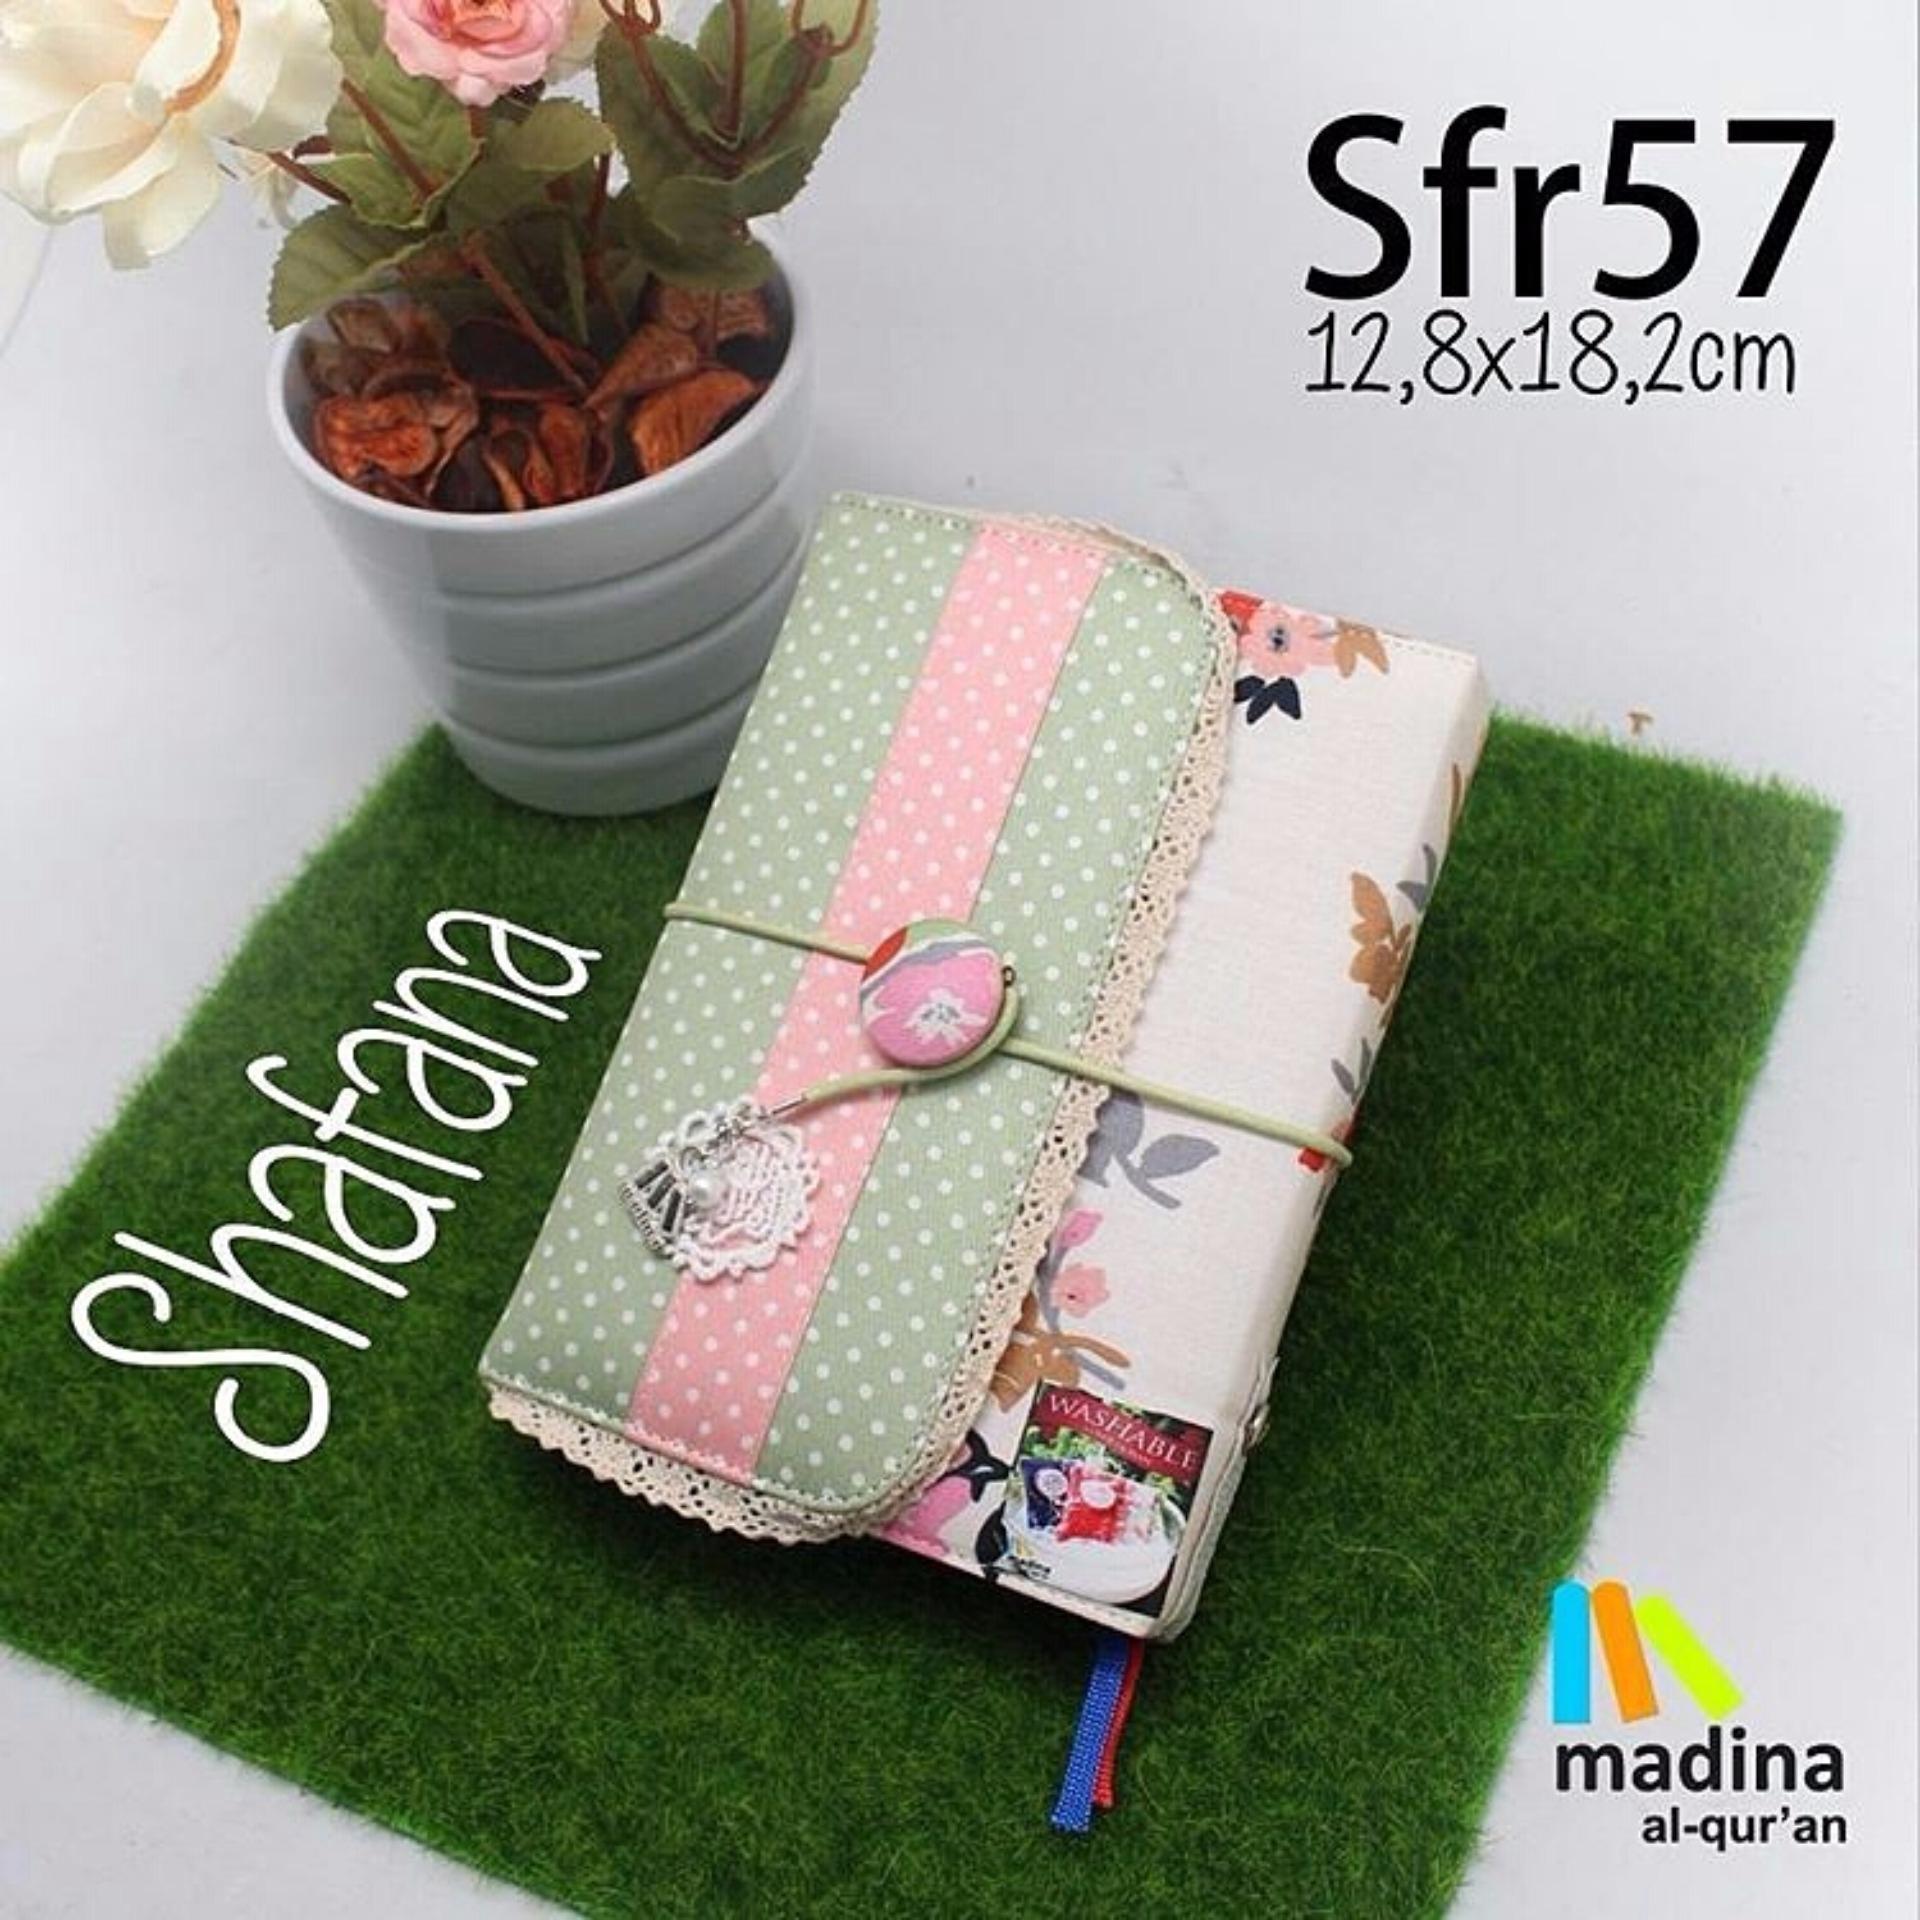 Al Quran Madina Shafana Rainbow Sf 57 Daftar Harga Terbaru Dan Alquran Zhafira Premium Zfr 64